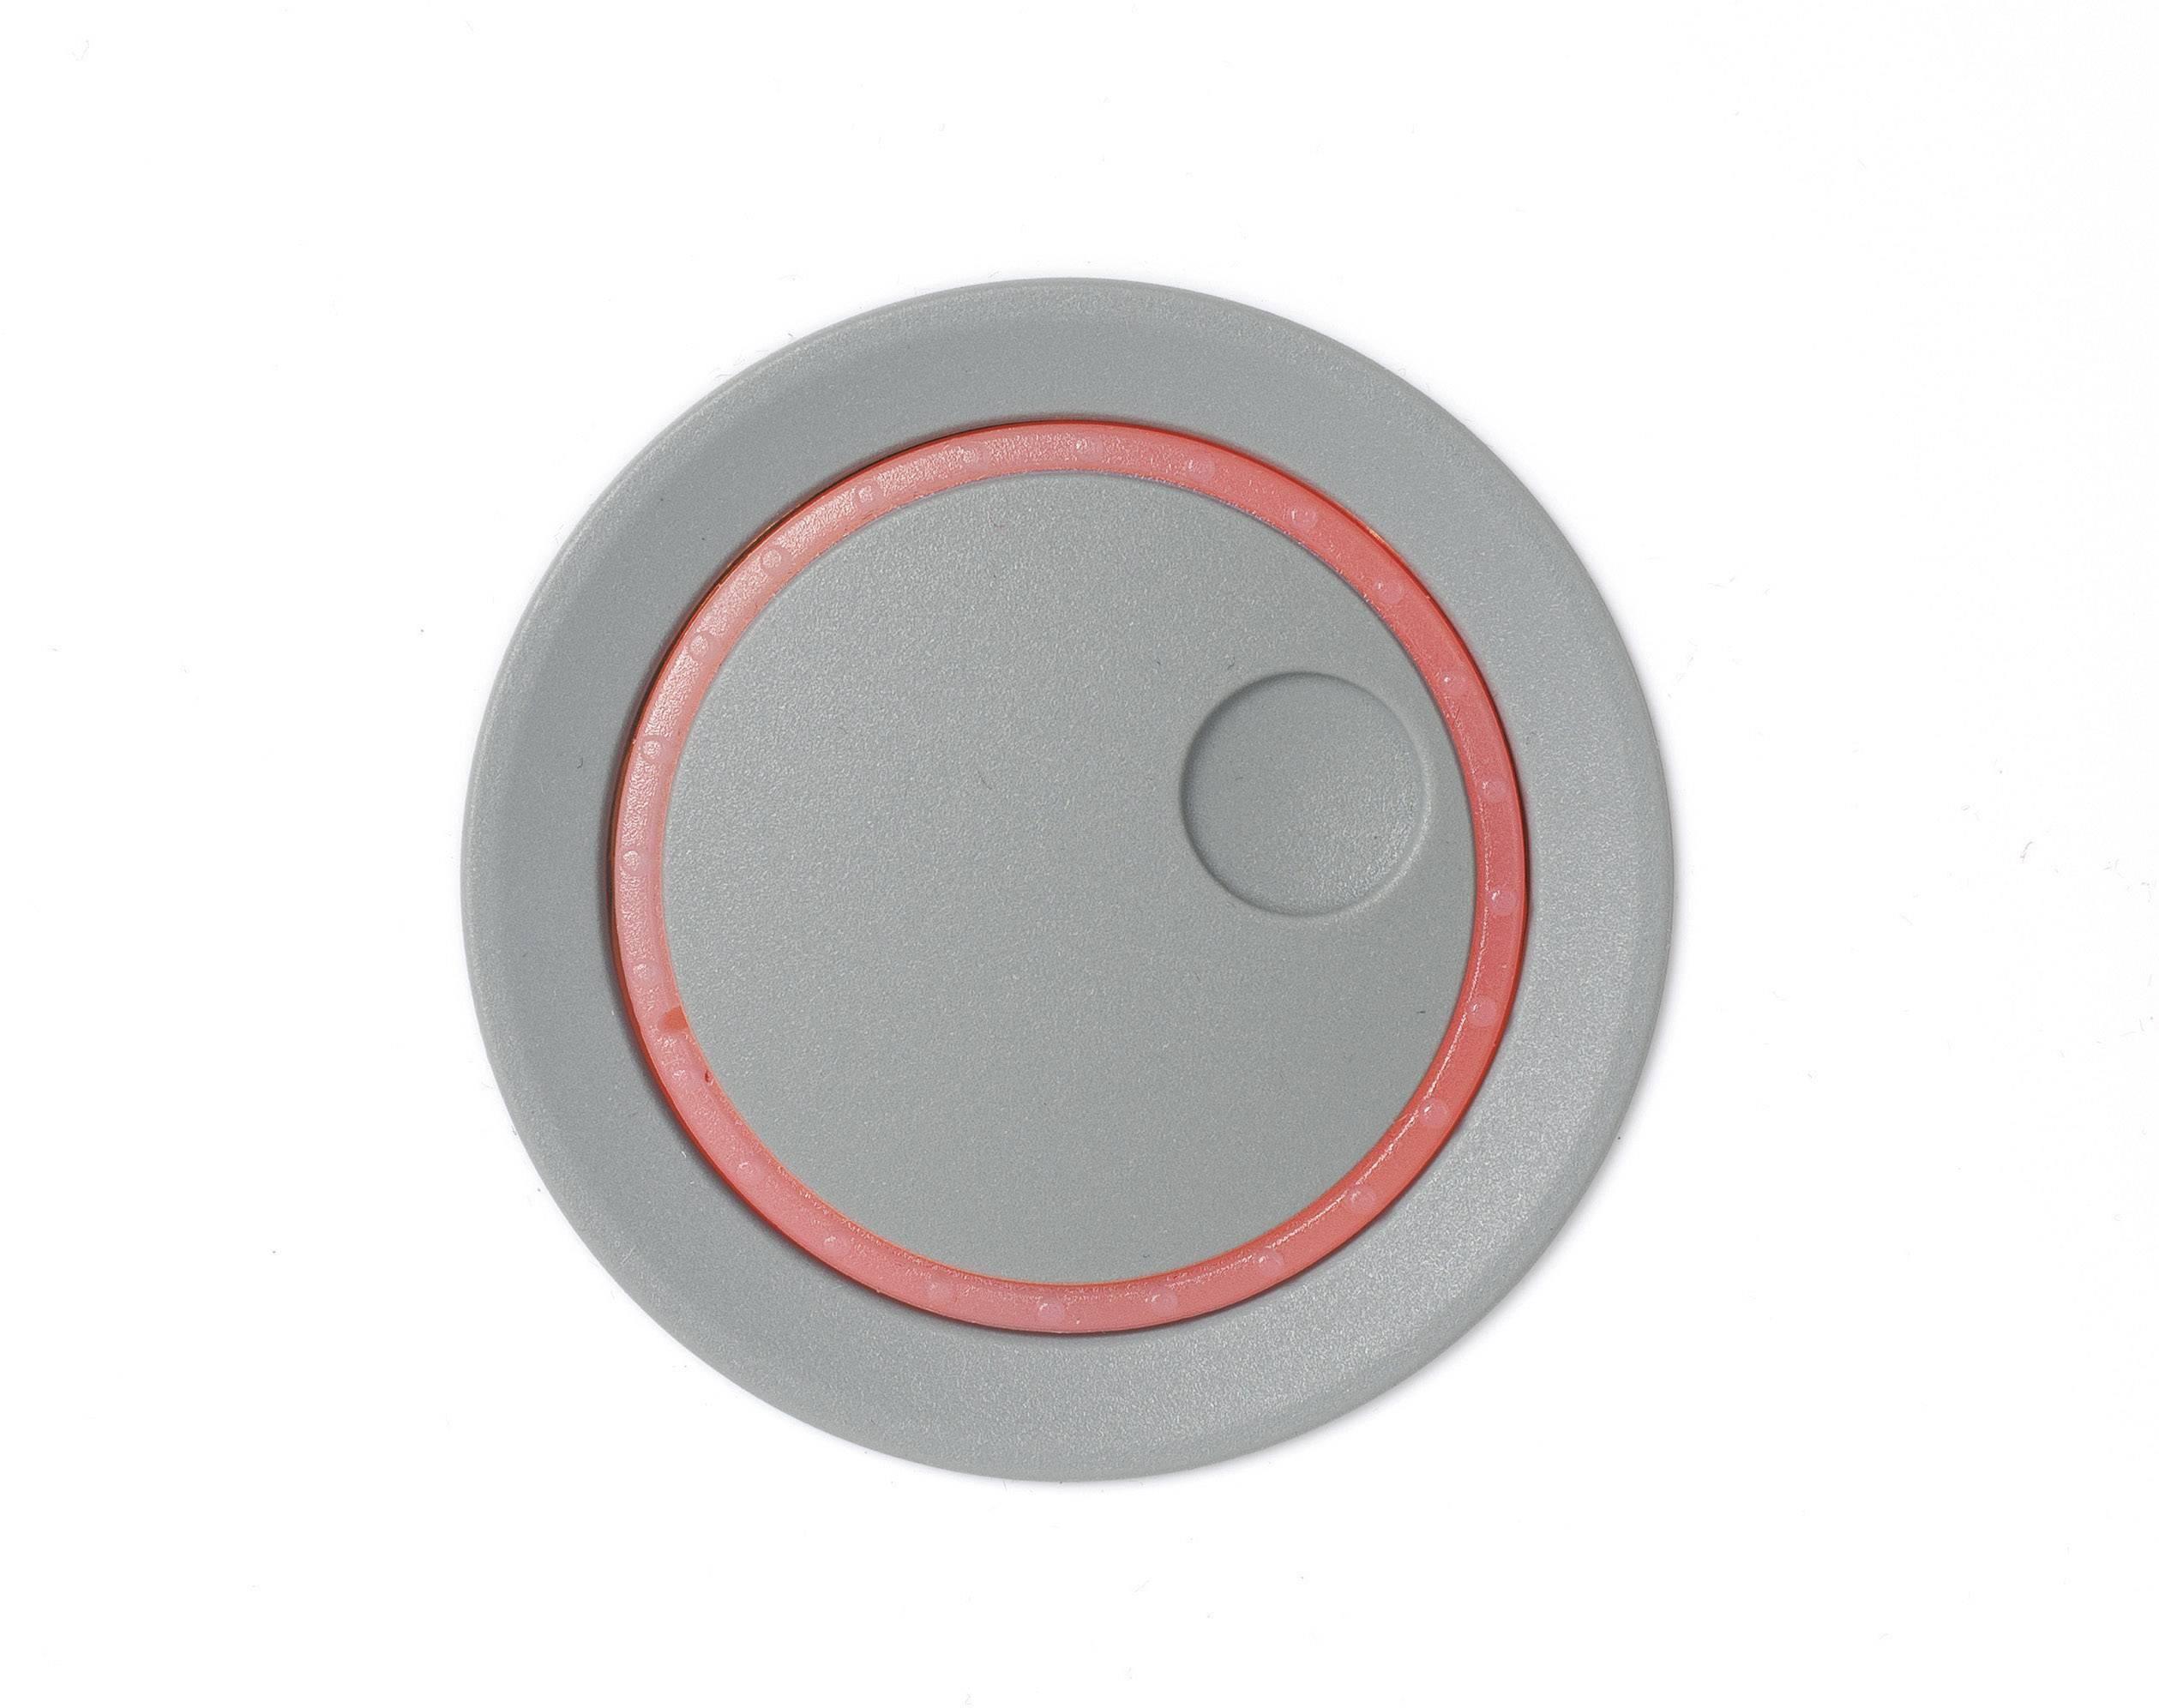 Otočný gombík OKW D8741028, (Ø x v) 41 mm x 21 mm, vulkán, 1 ks